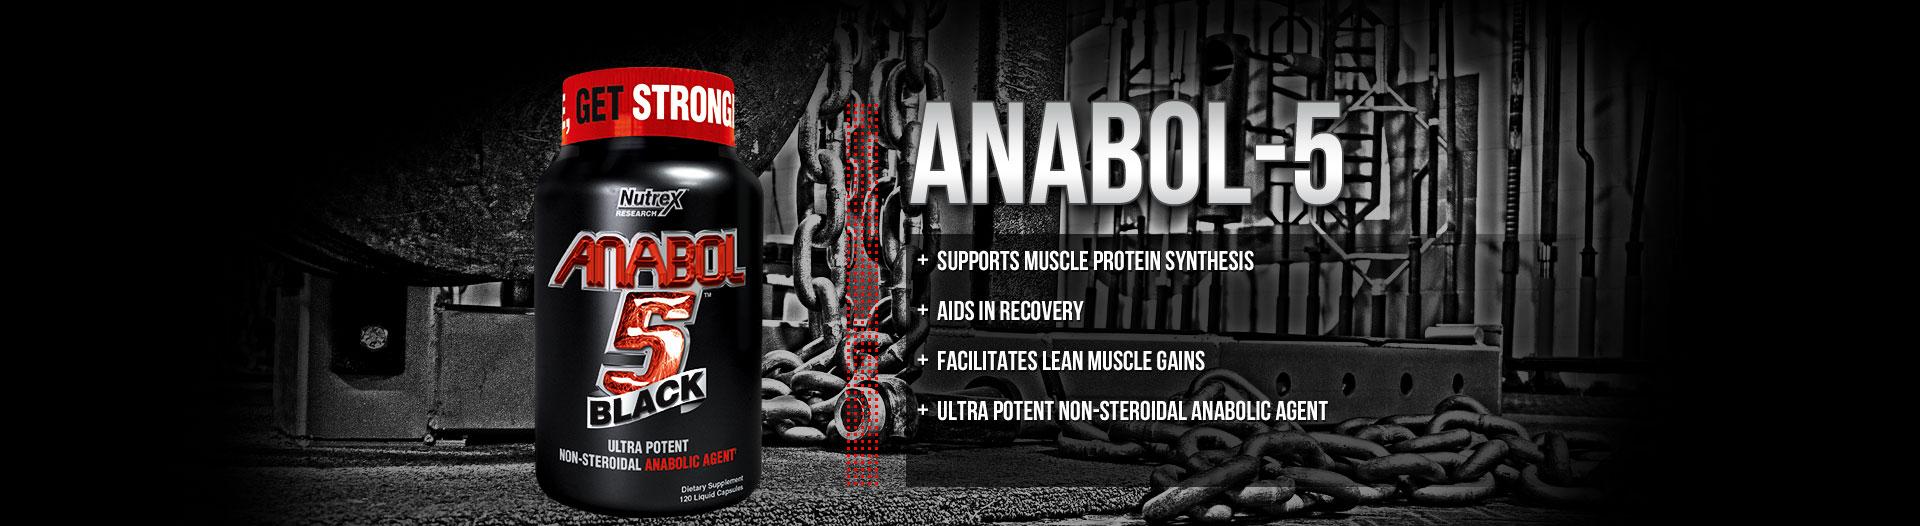 Anabol 5 Black